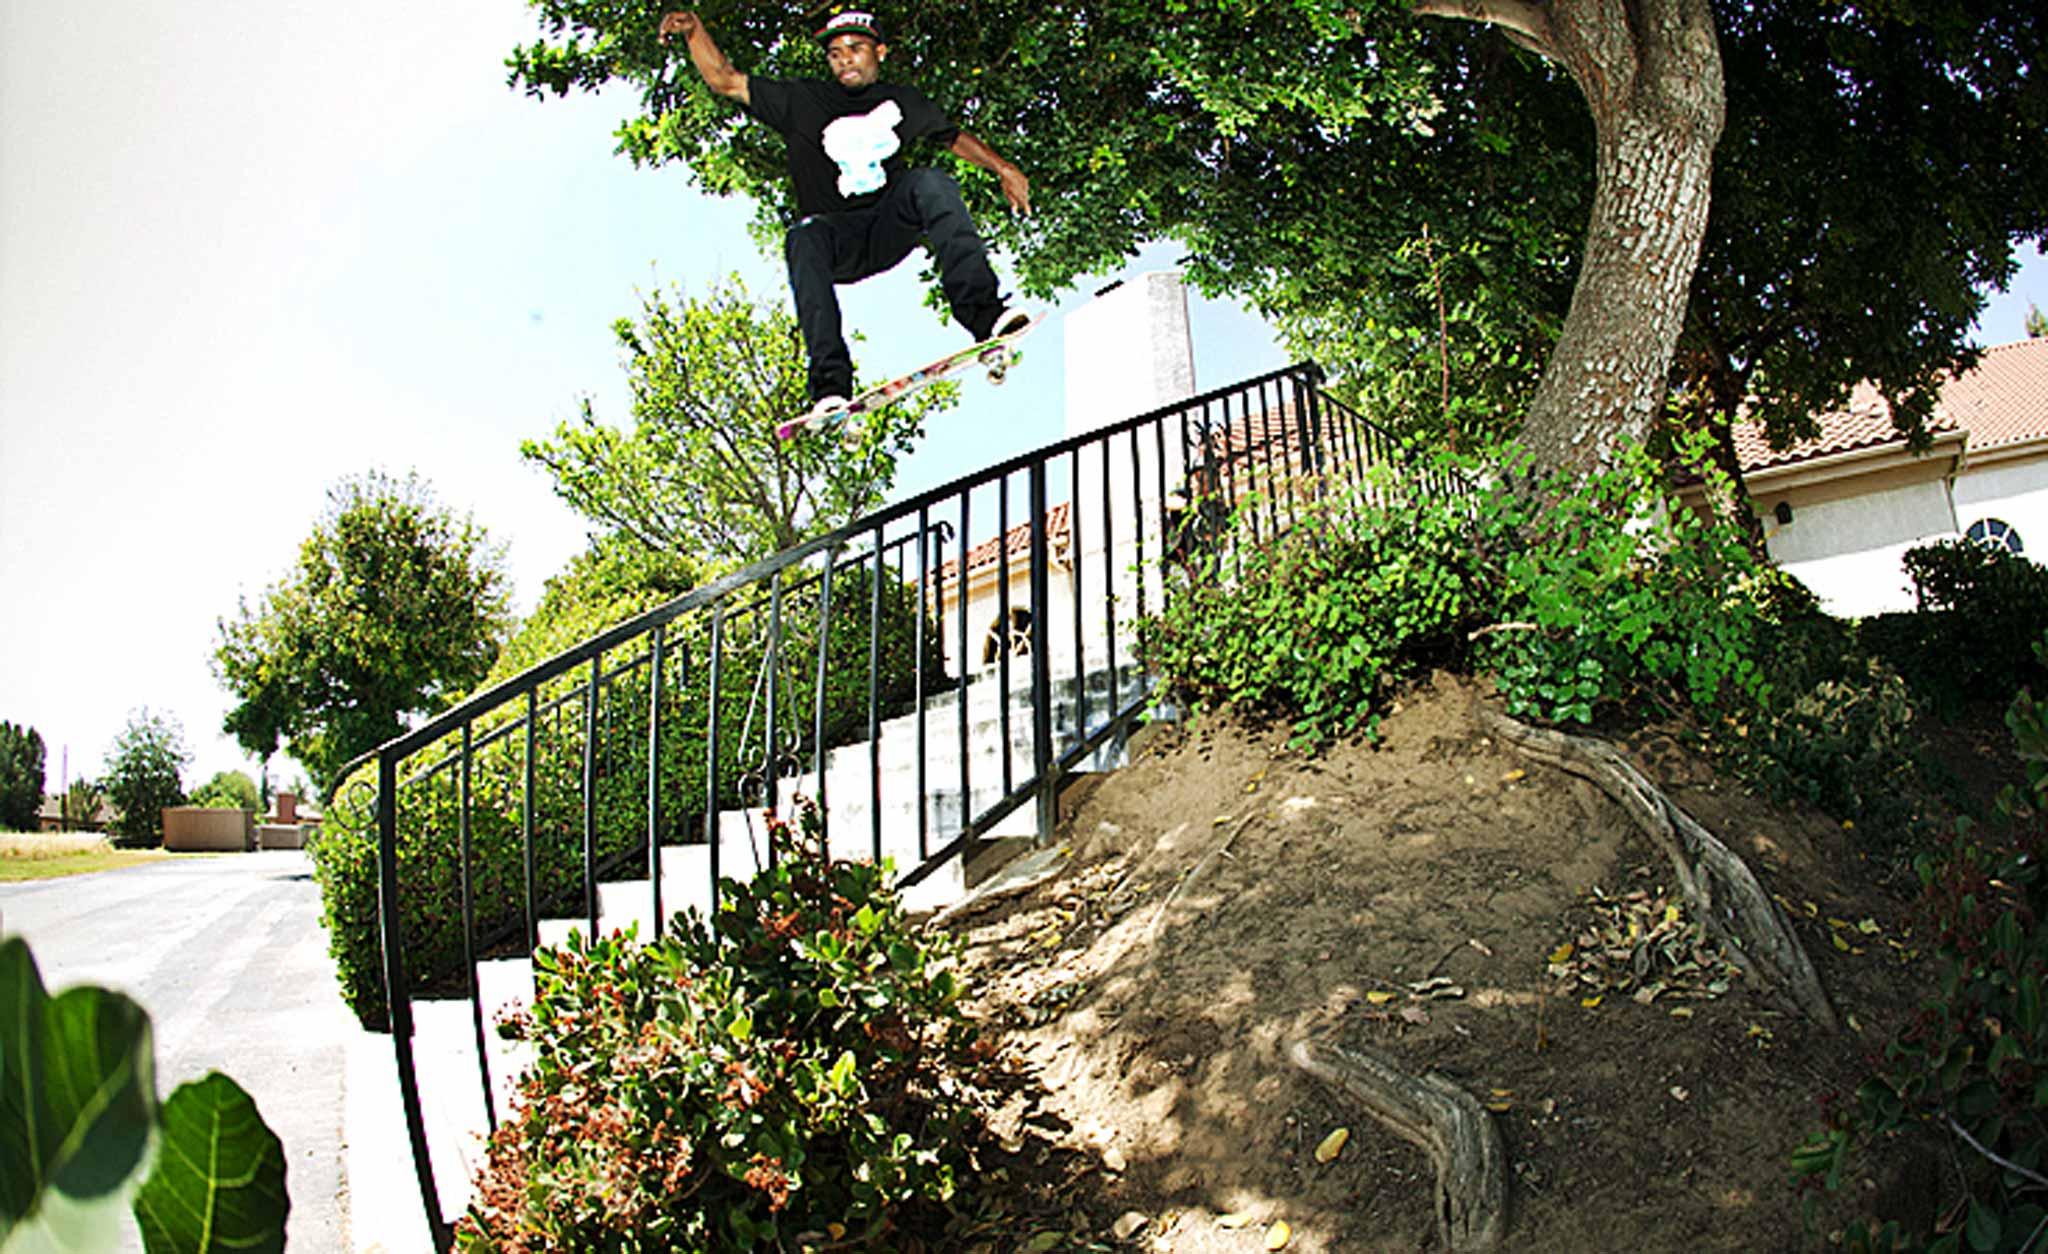 Derrick Wilson, Lipslide